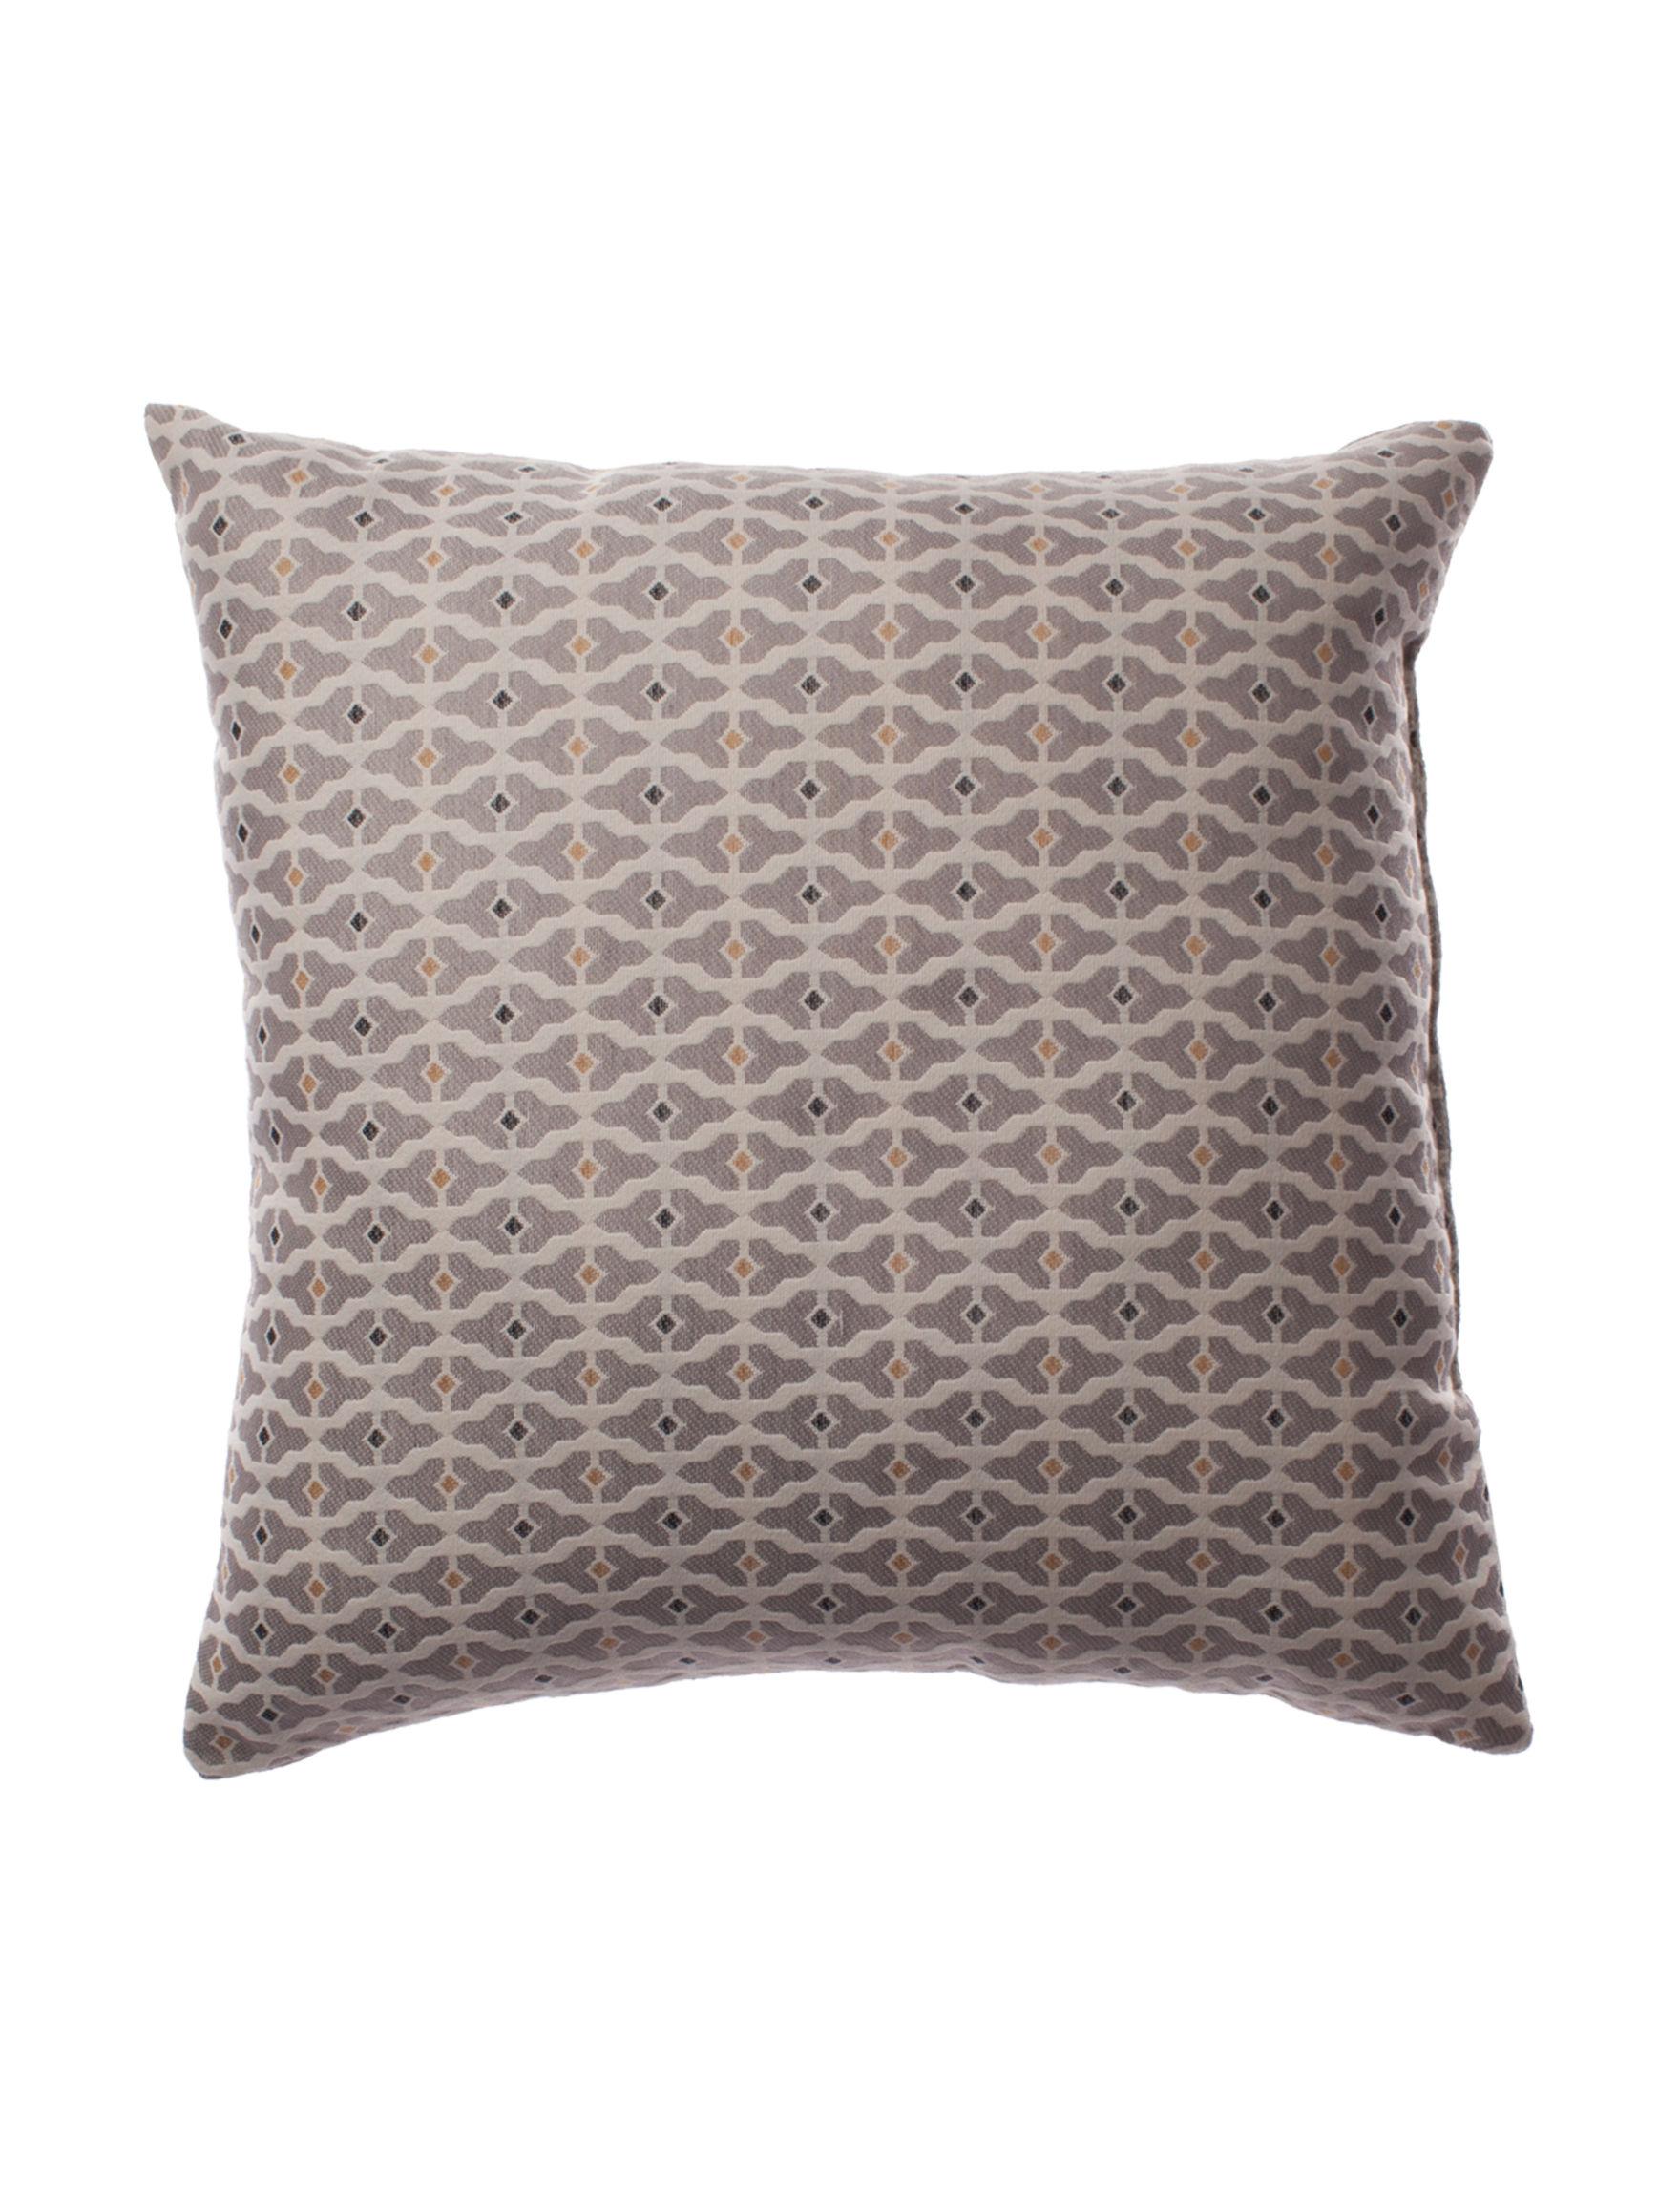 Home Fashions International Grey Decorative Pillows